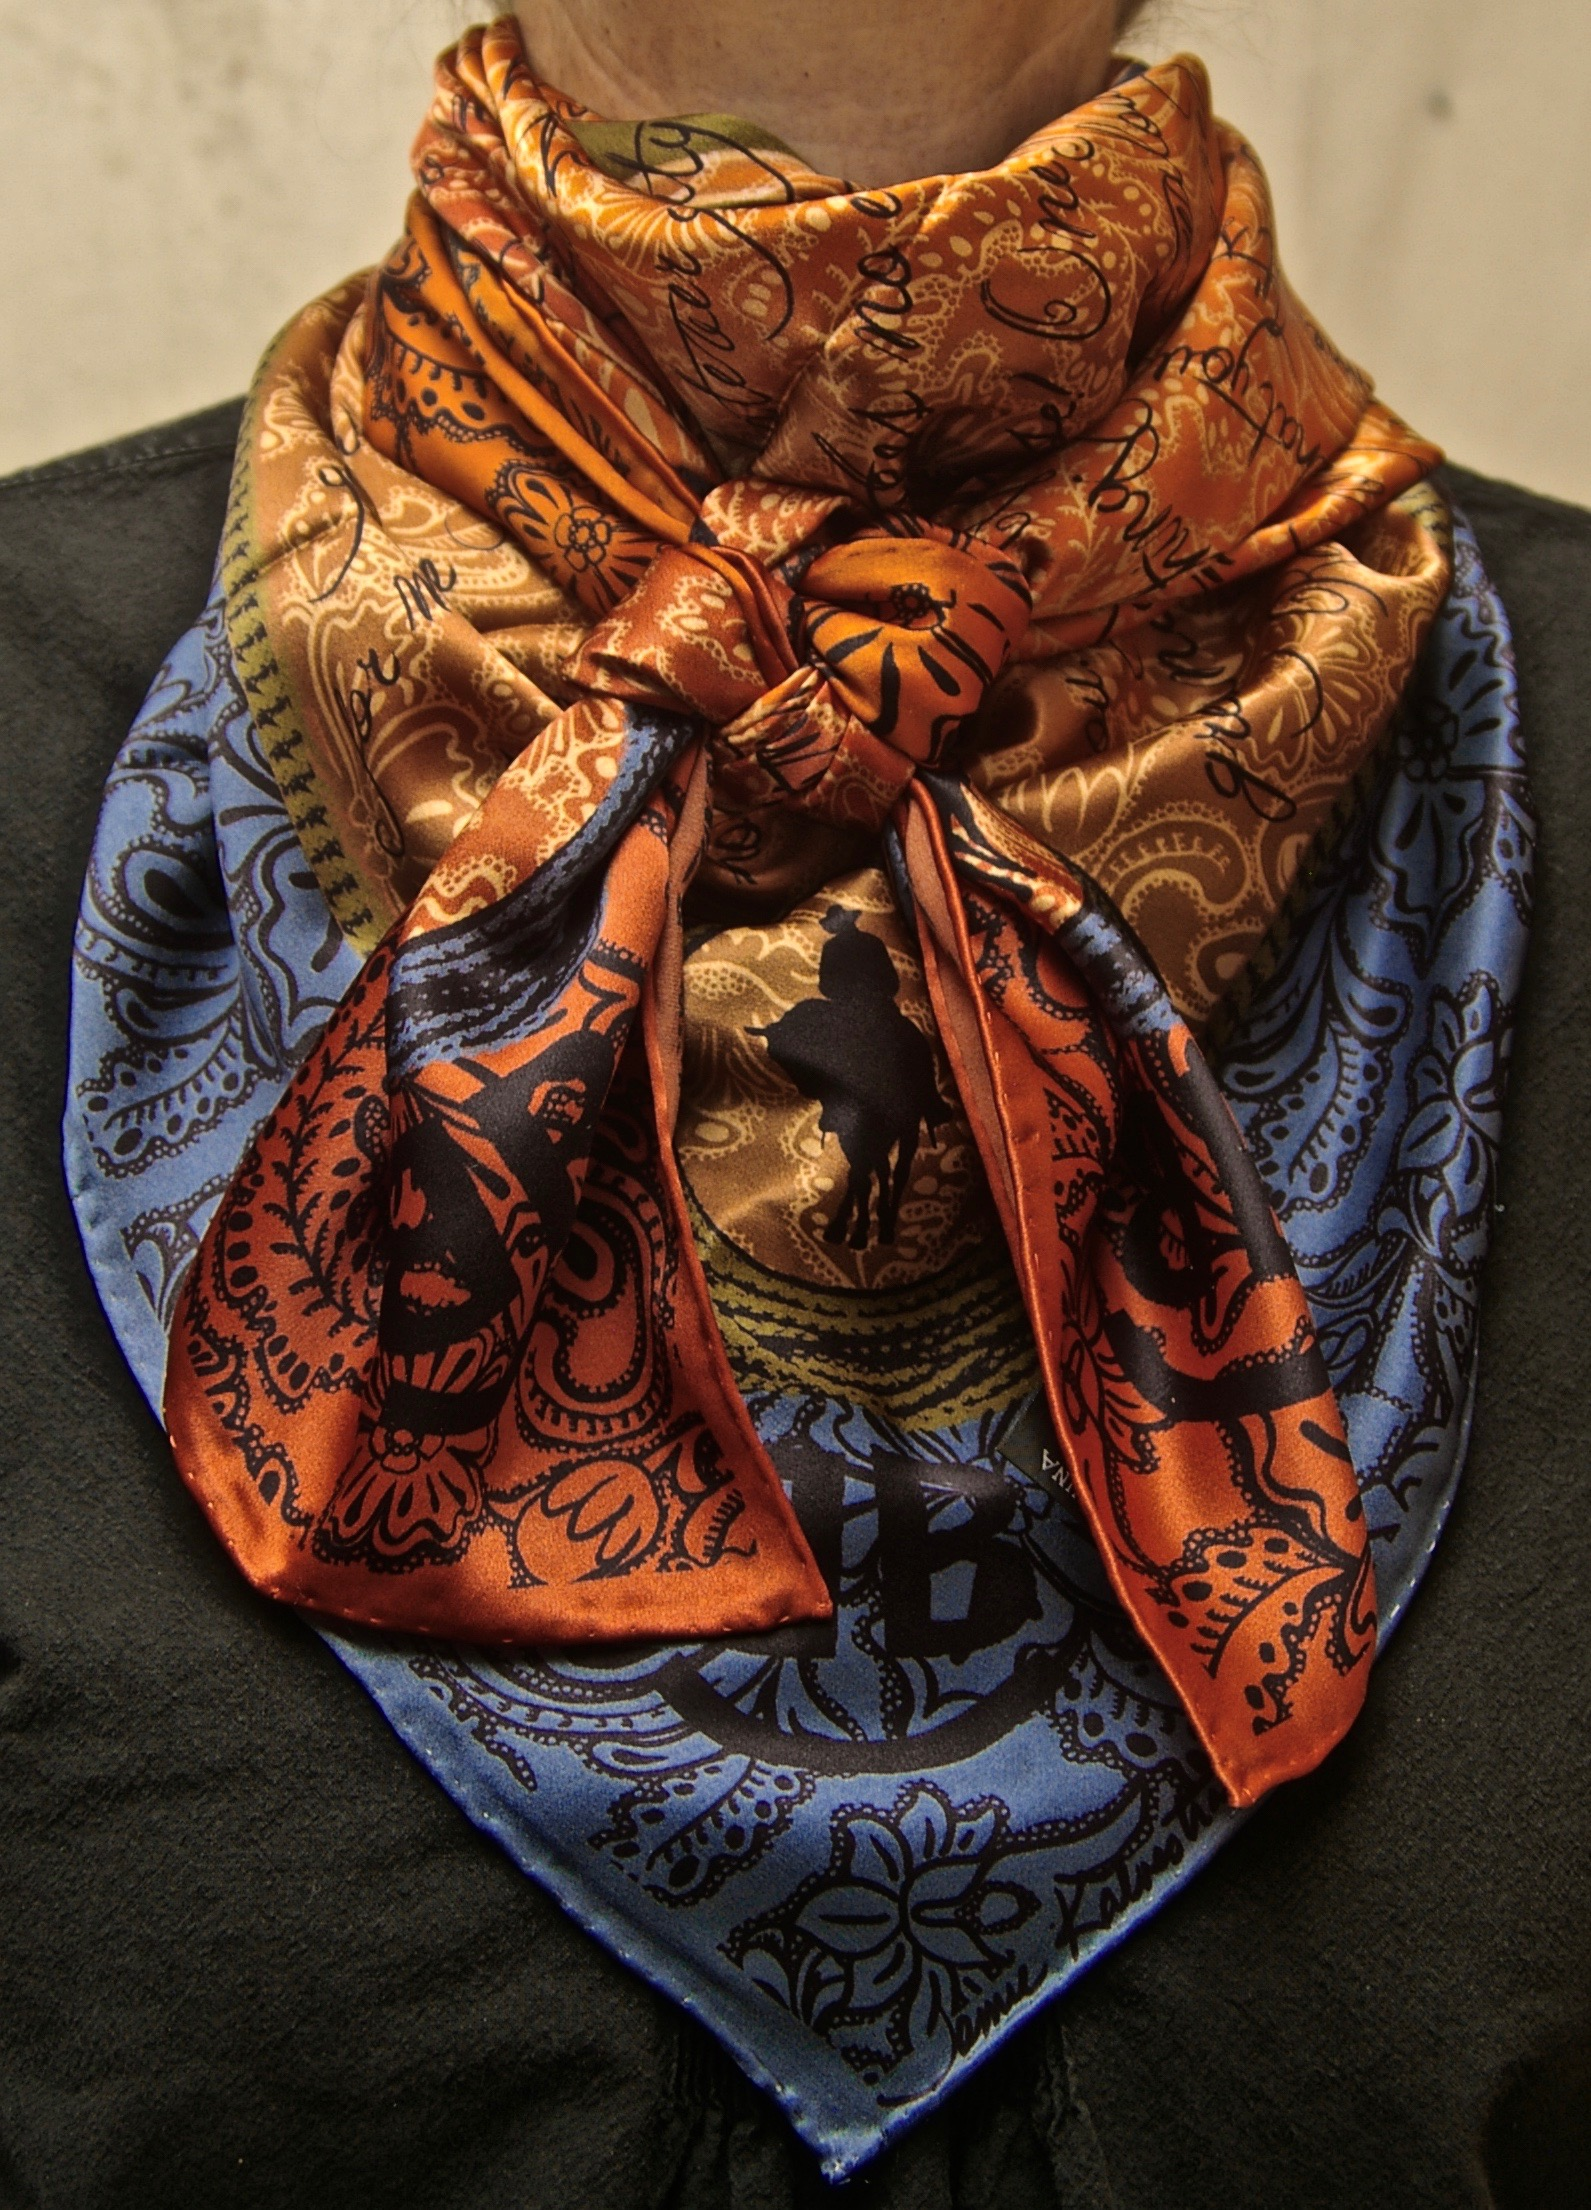 The Houlihan Wild Wild Rags Silk Scarf